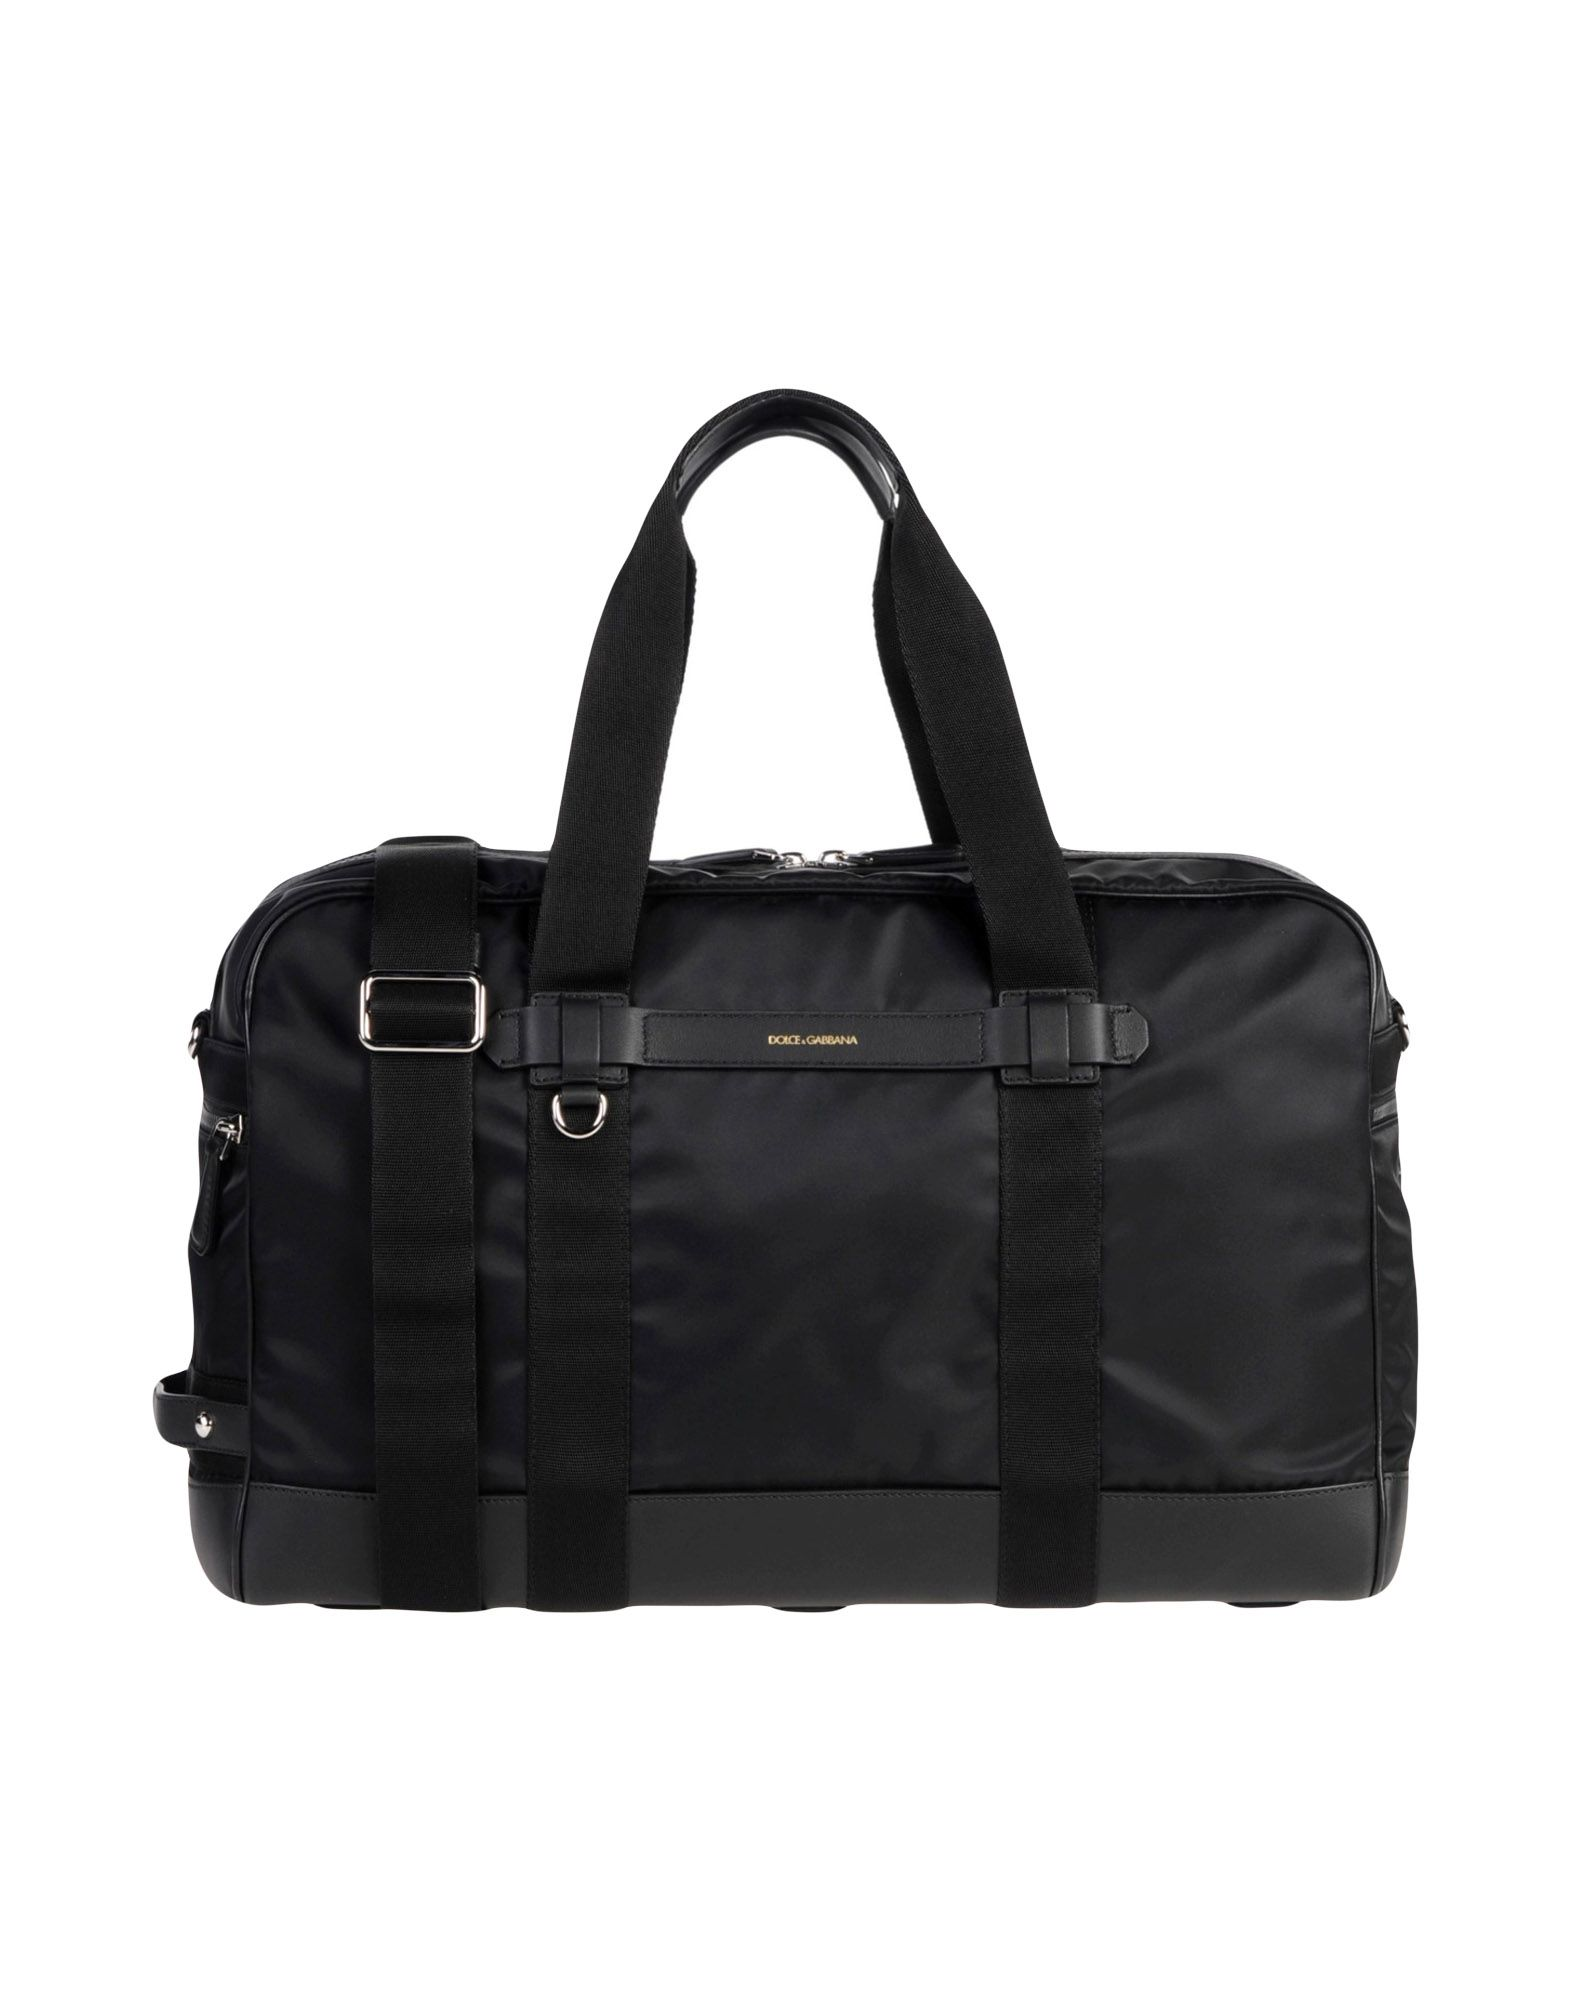 960dd9ecae Men s Travel   Duffel Bag